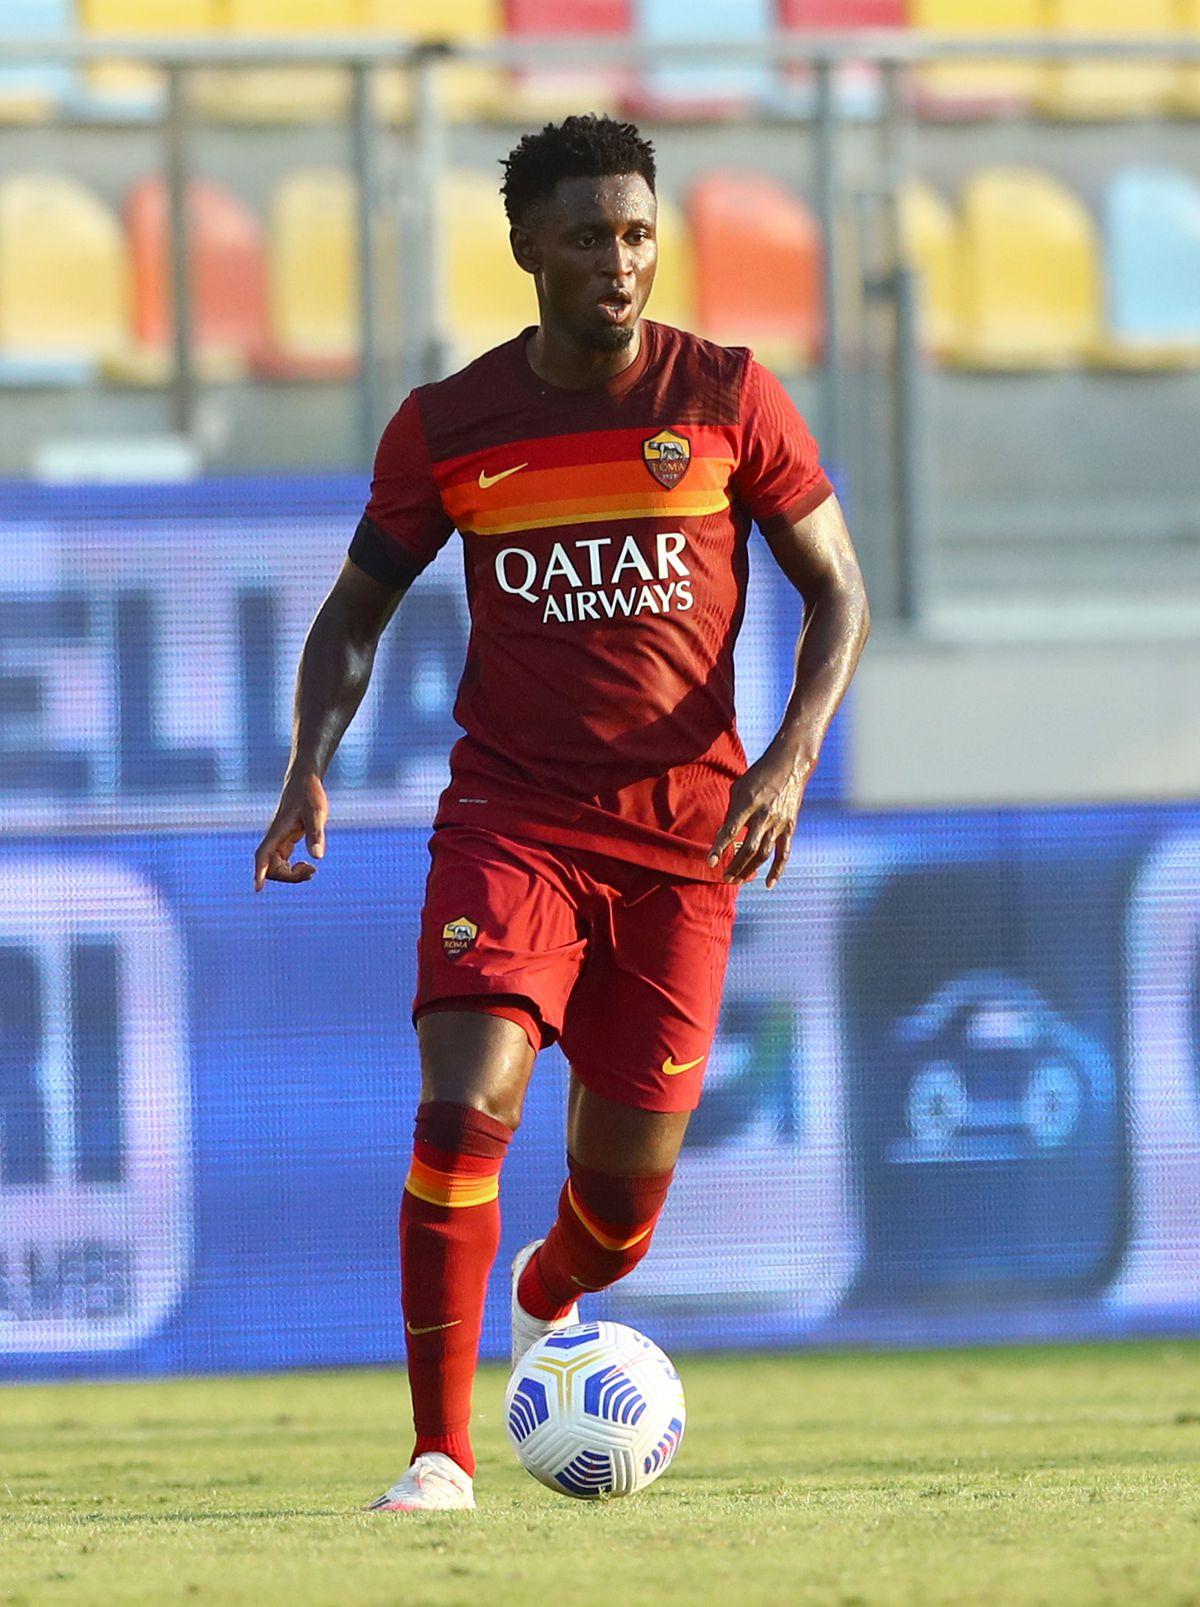 Frosinone Calcio v AS Roma - Pre-Season Friendly